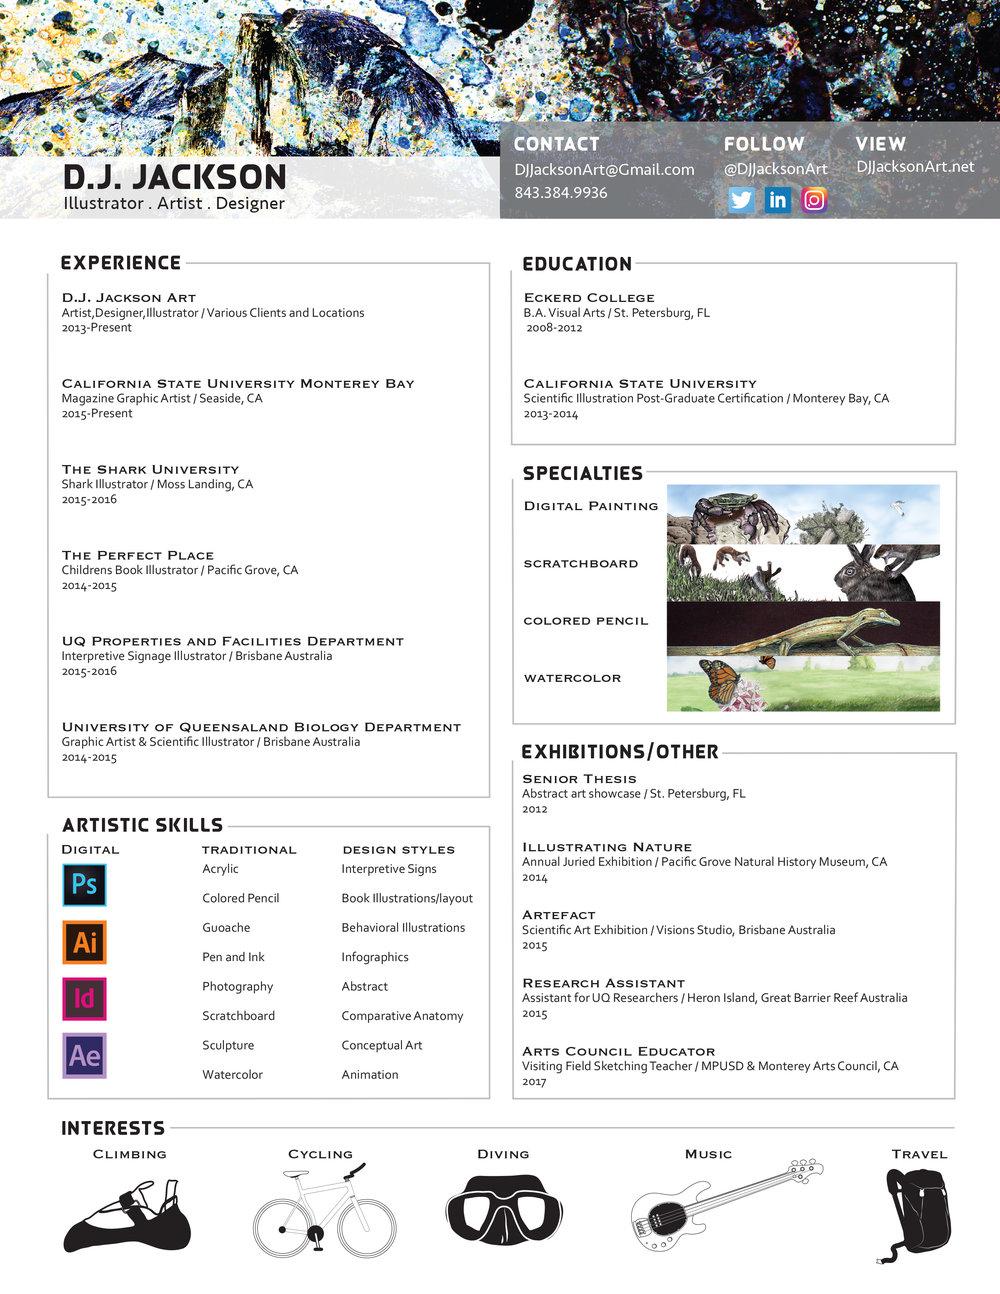 Resume — D.J. Jackson Art